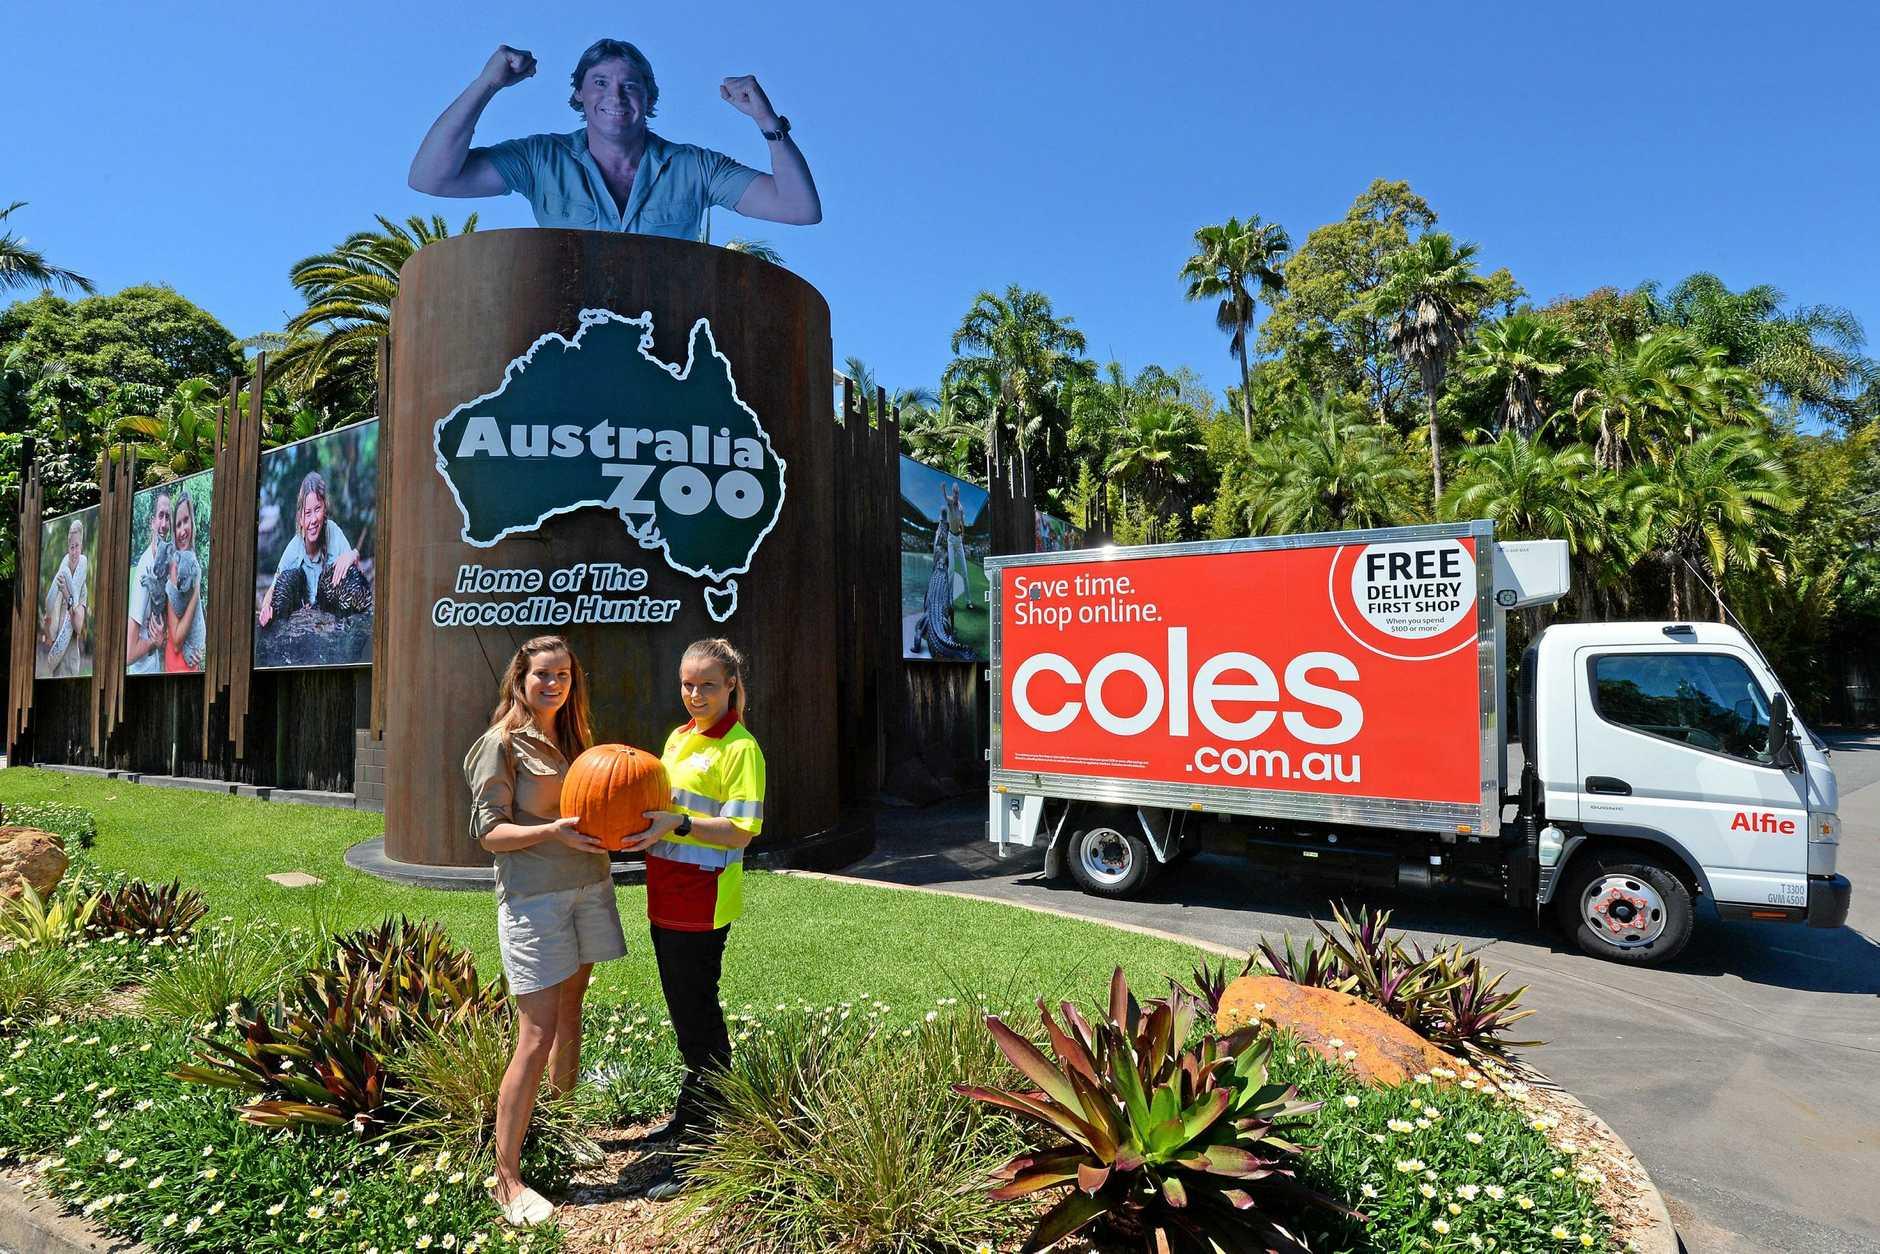 Coles online customer service agent Emma drops off a 150 Halloween pumpkins to Australia Zoo event coordinator Sophie Jeffs (right).